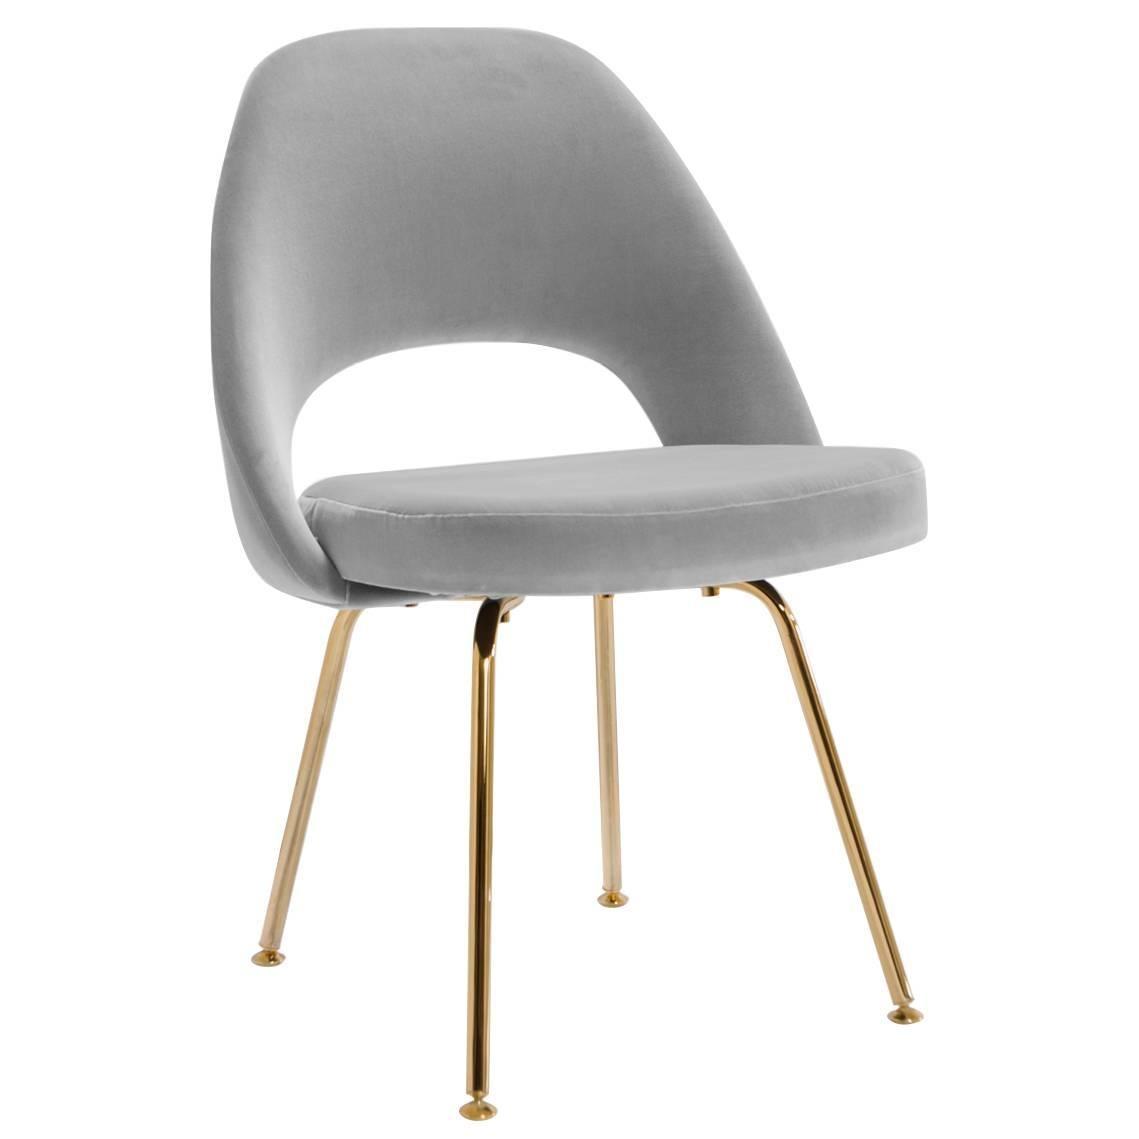 Saarinen Executive Armless Chairs In Dove Velvet 24k Gold Edition